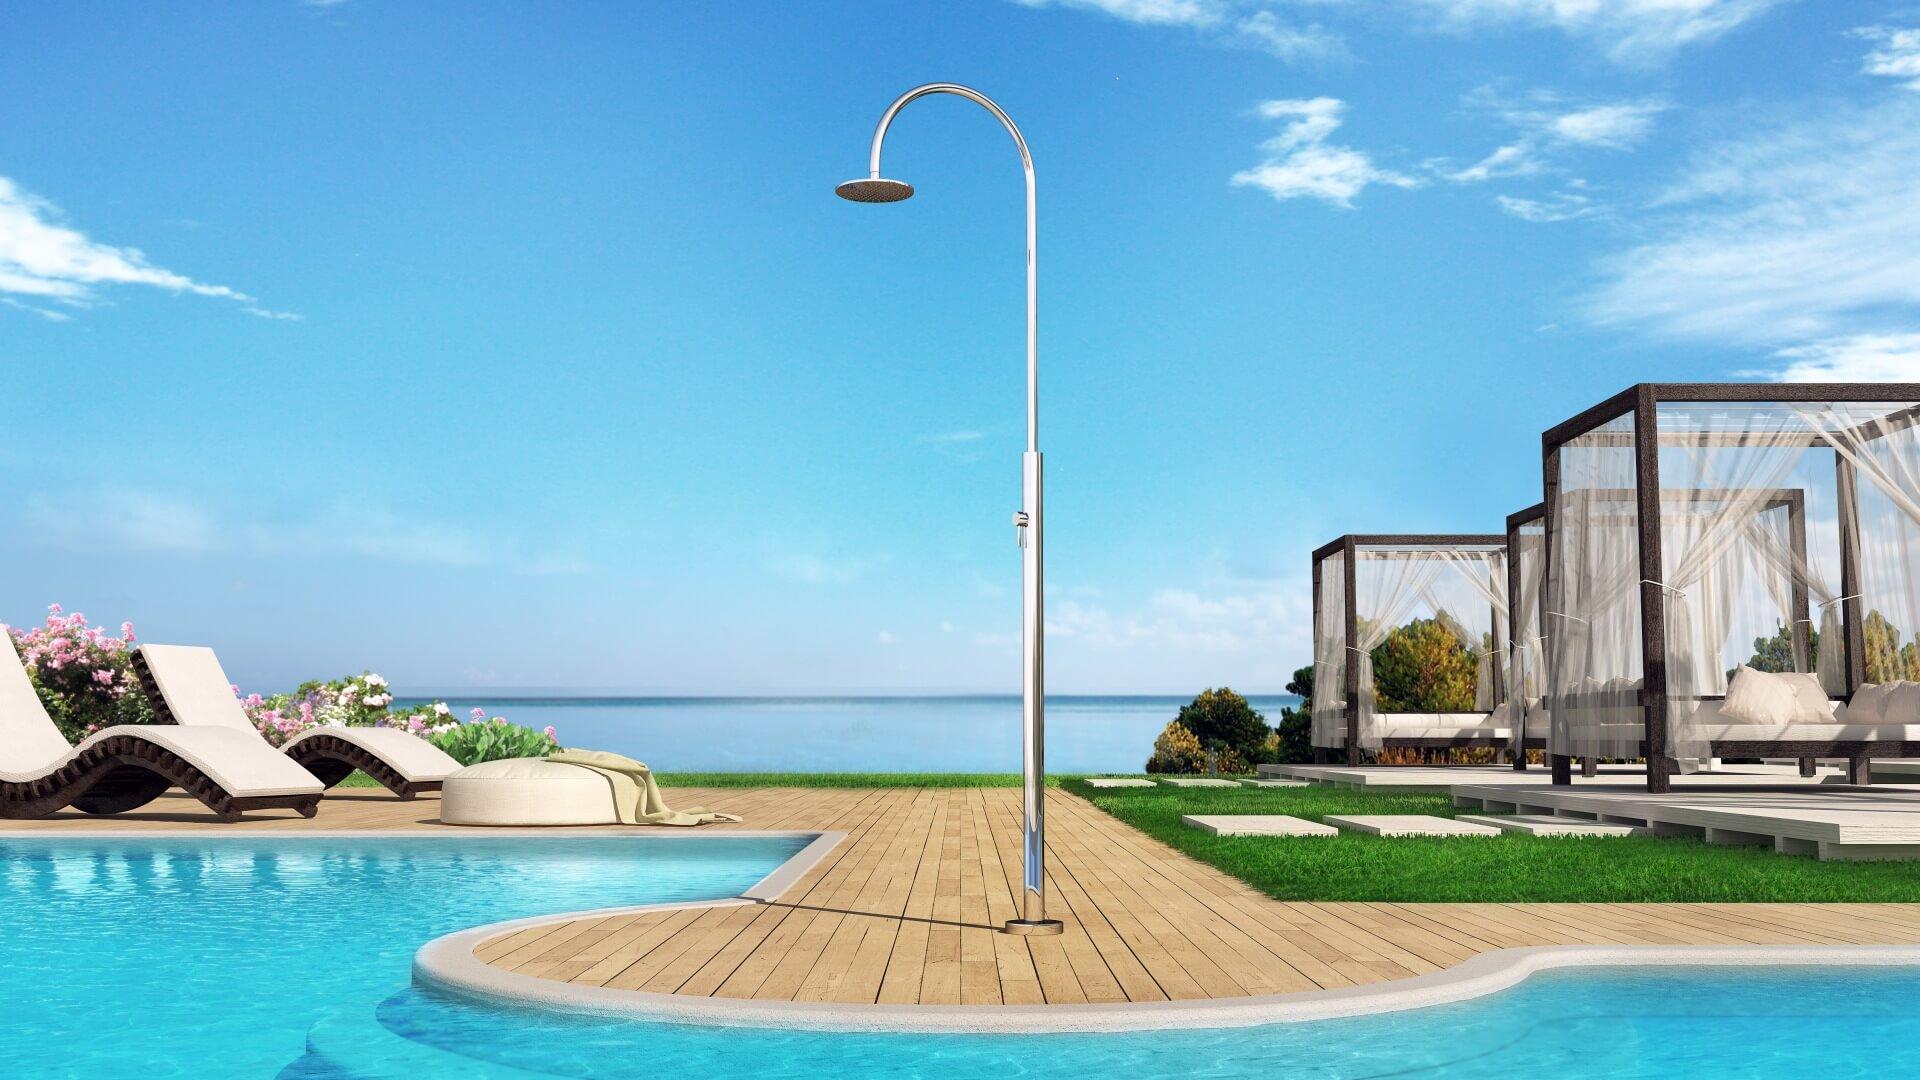 Photo douche extérieure, piscine, jardin - Aria Cylinder Inoxstyle